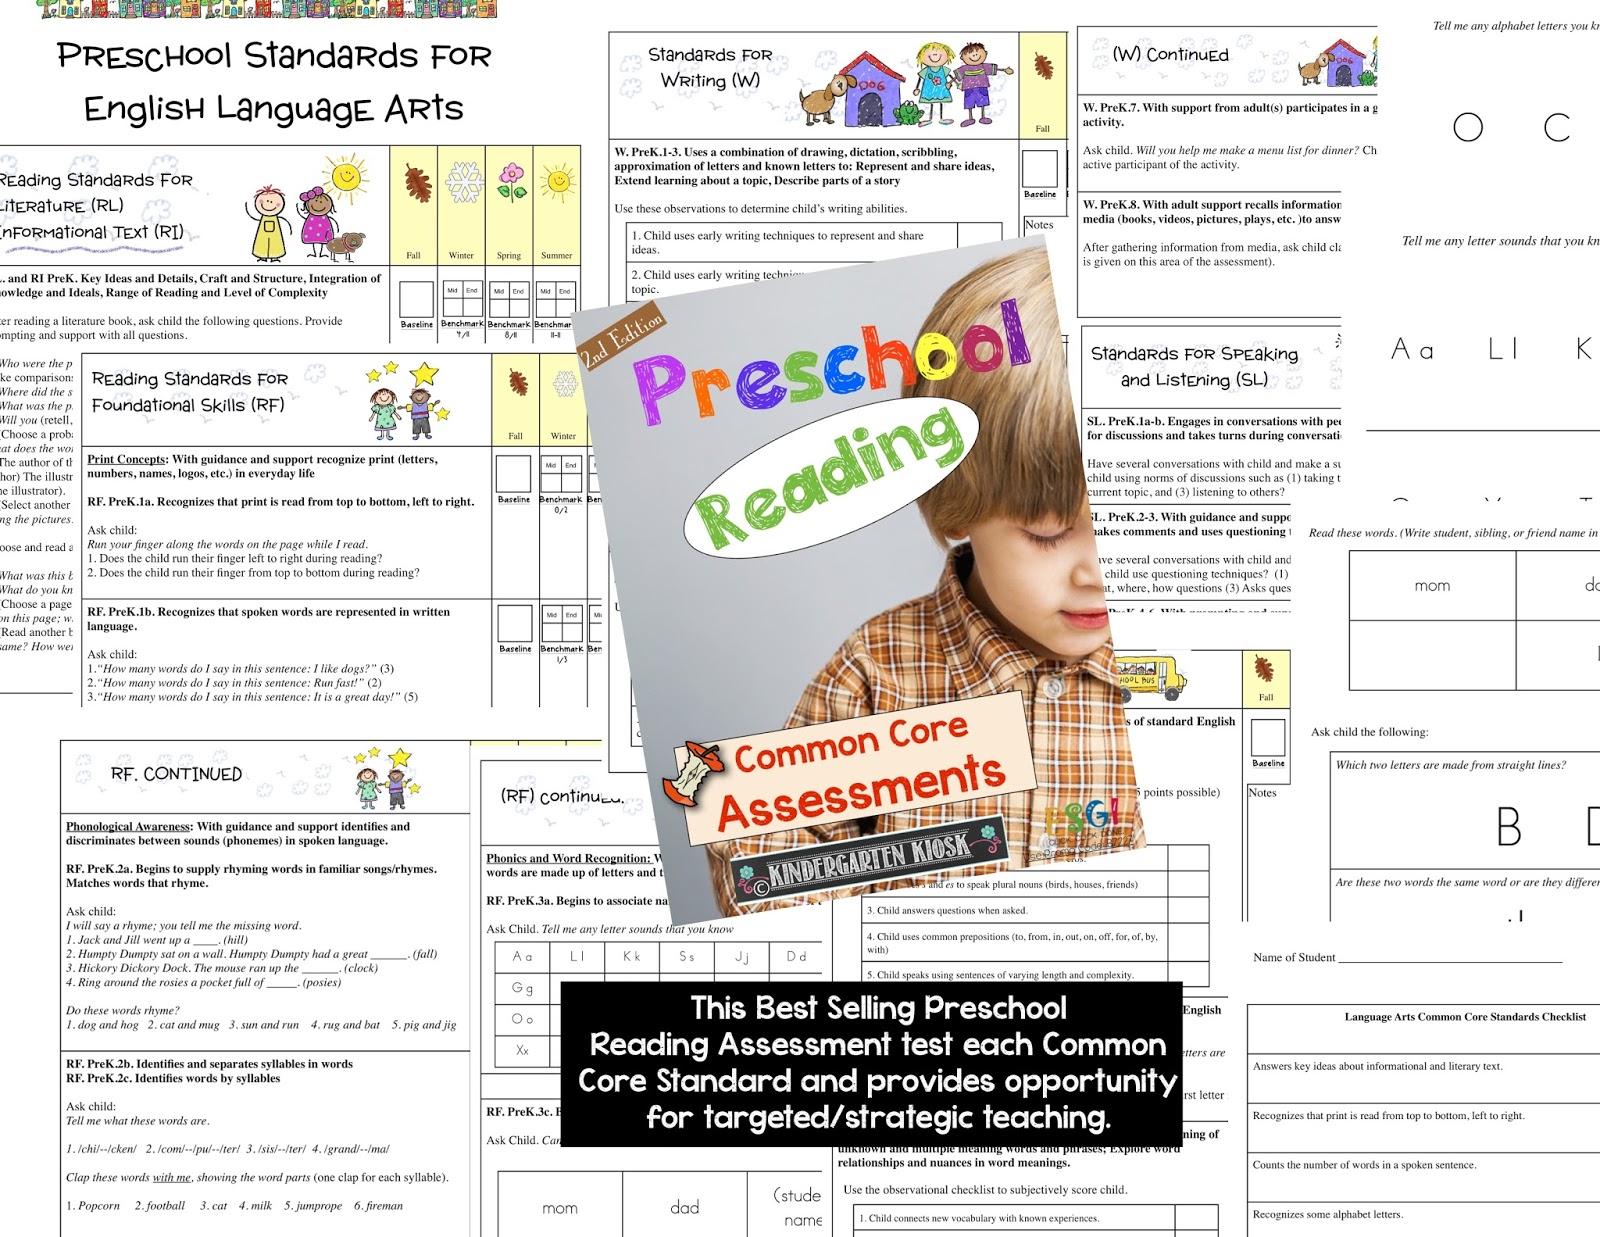 Kindergarten Kiosk Kindergarten And Preschool Math And Language Arts Common Core Assessments